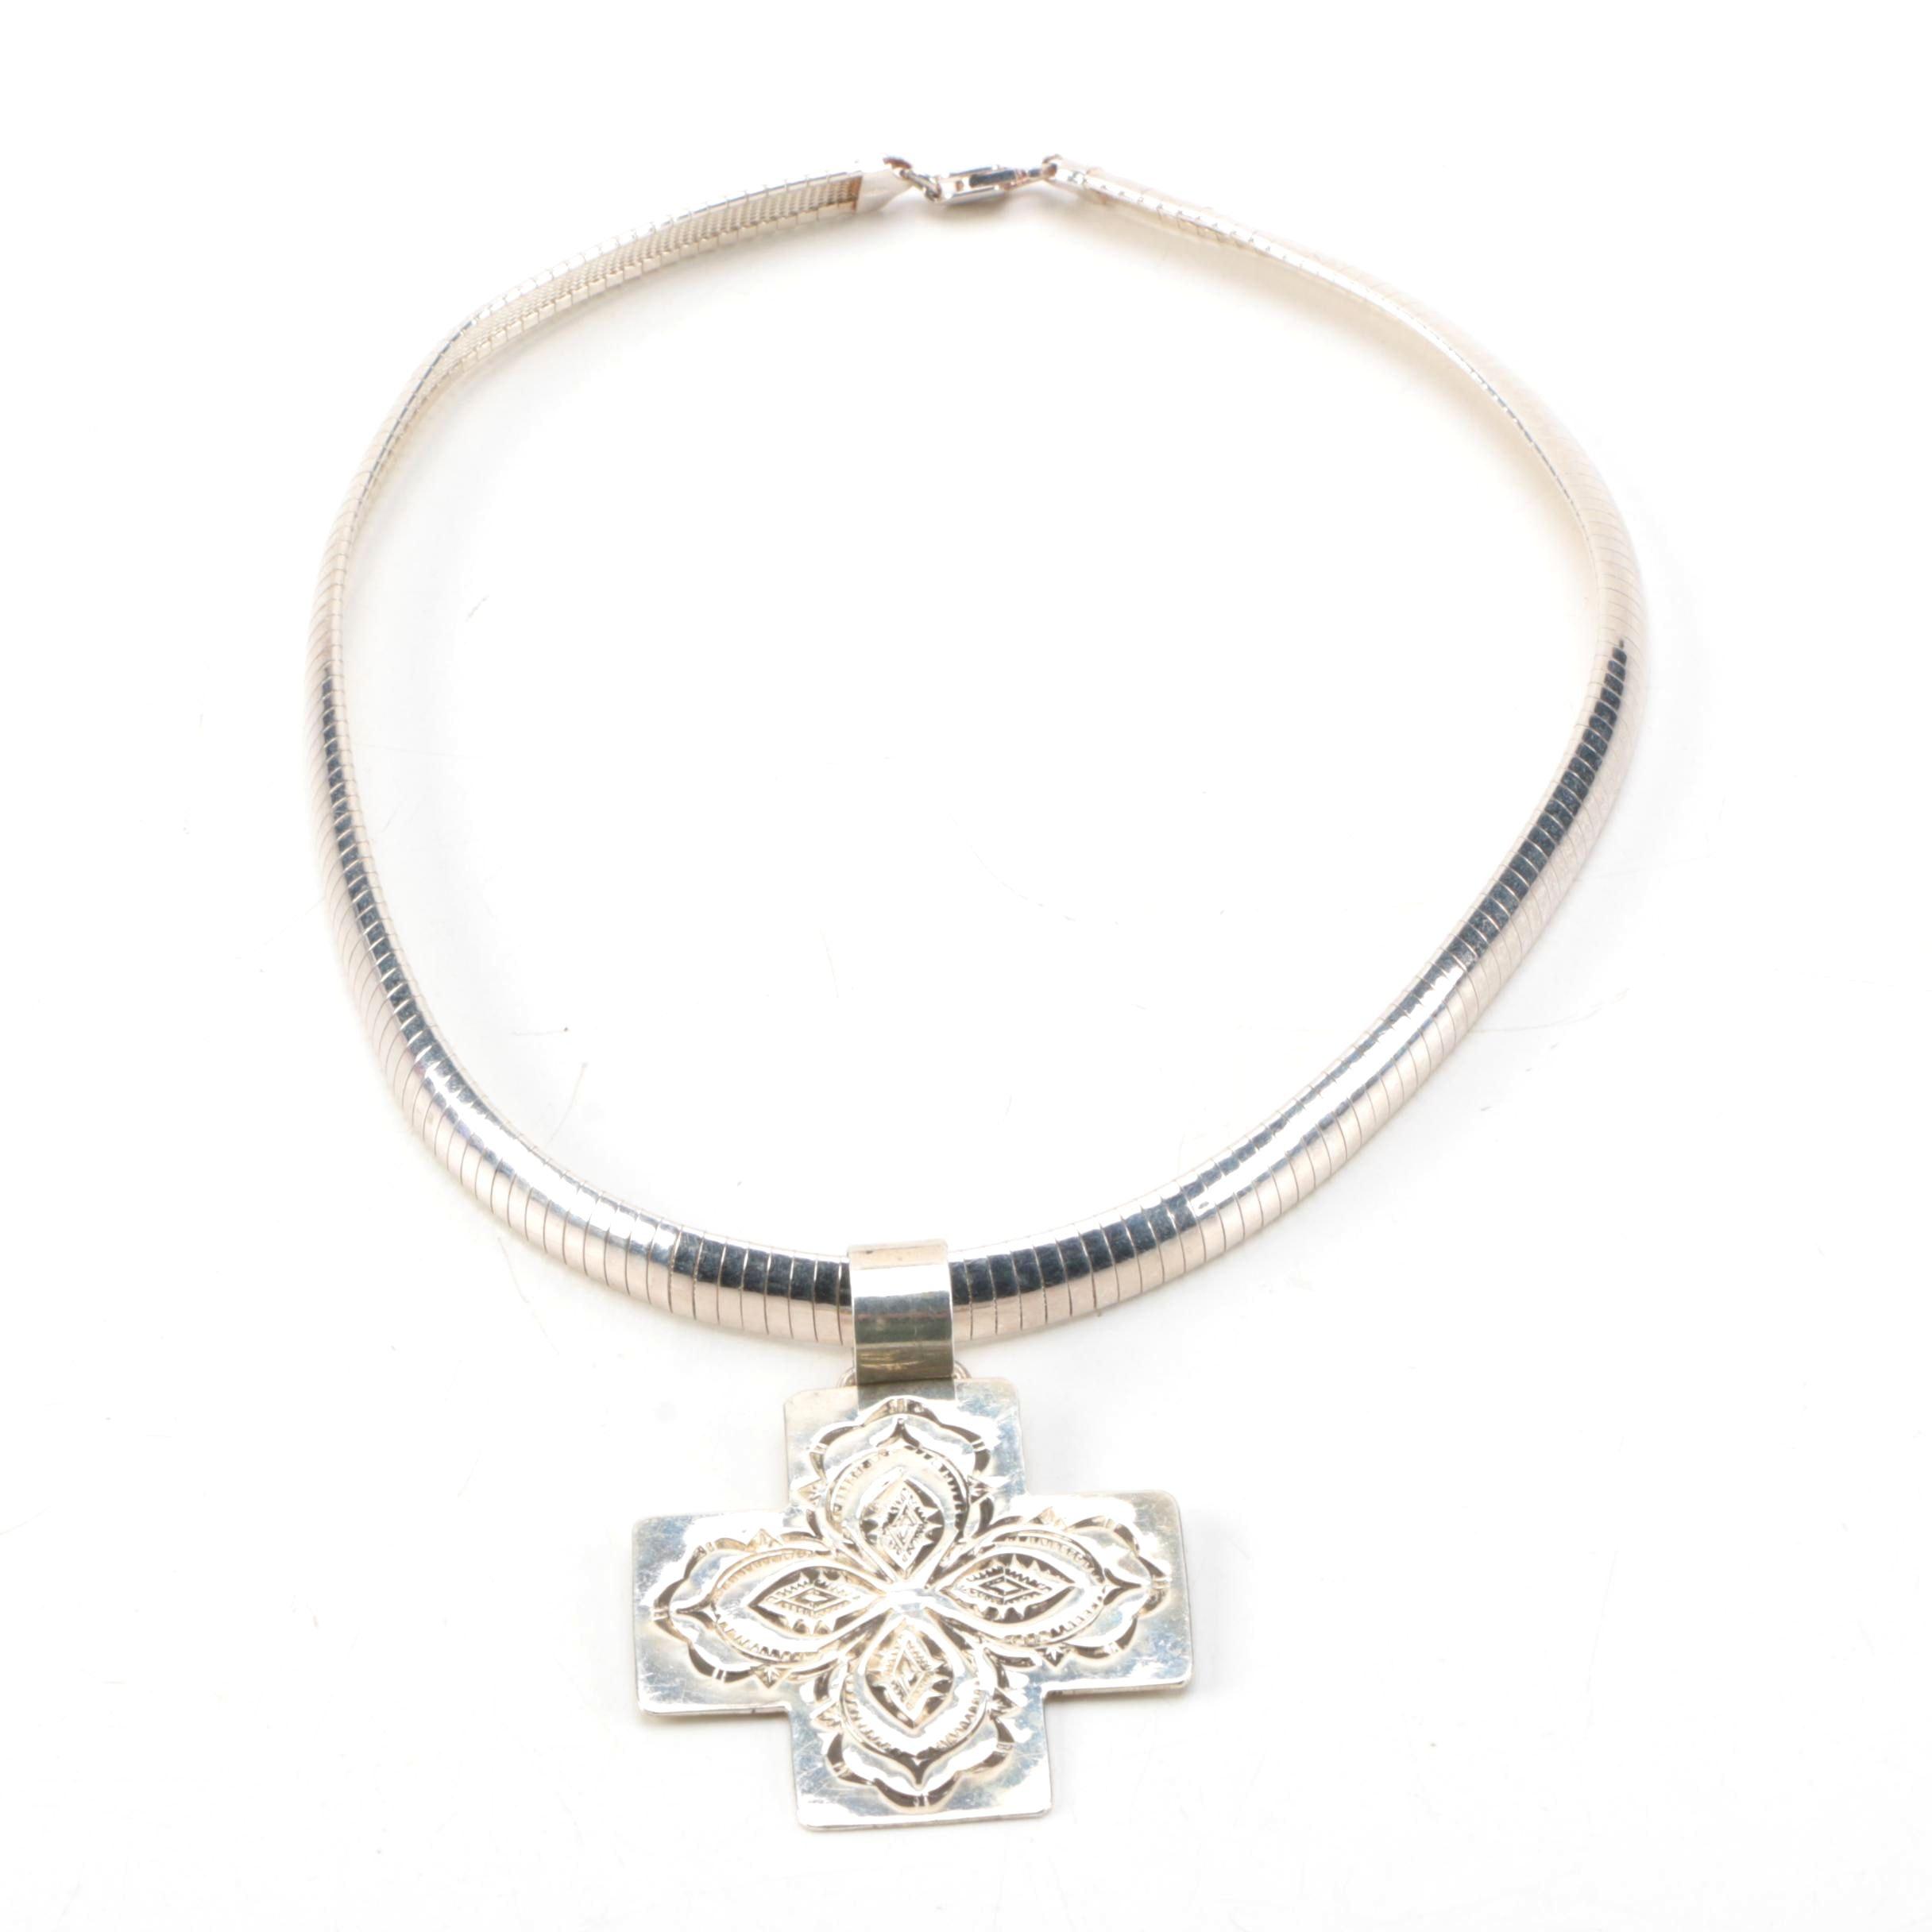 Alvin Toadachaane Navajo Sterling Silver Cross Pendant Necklace